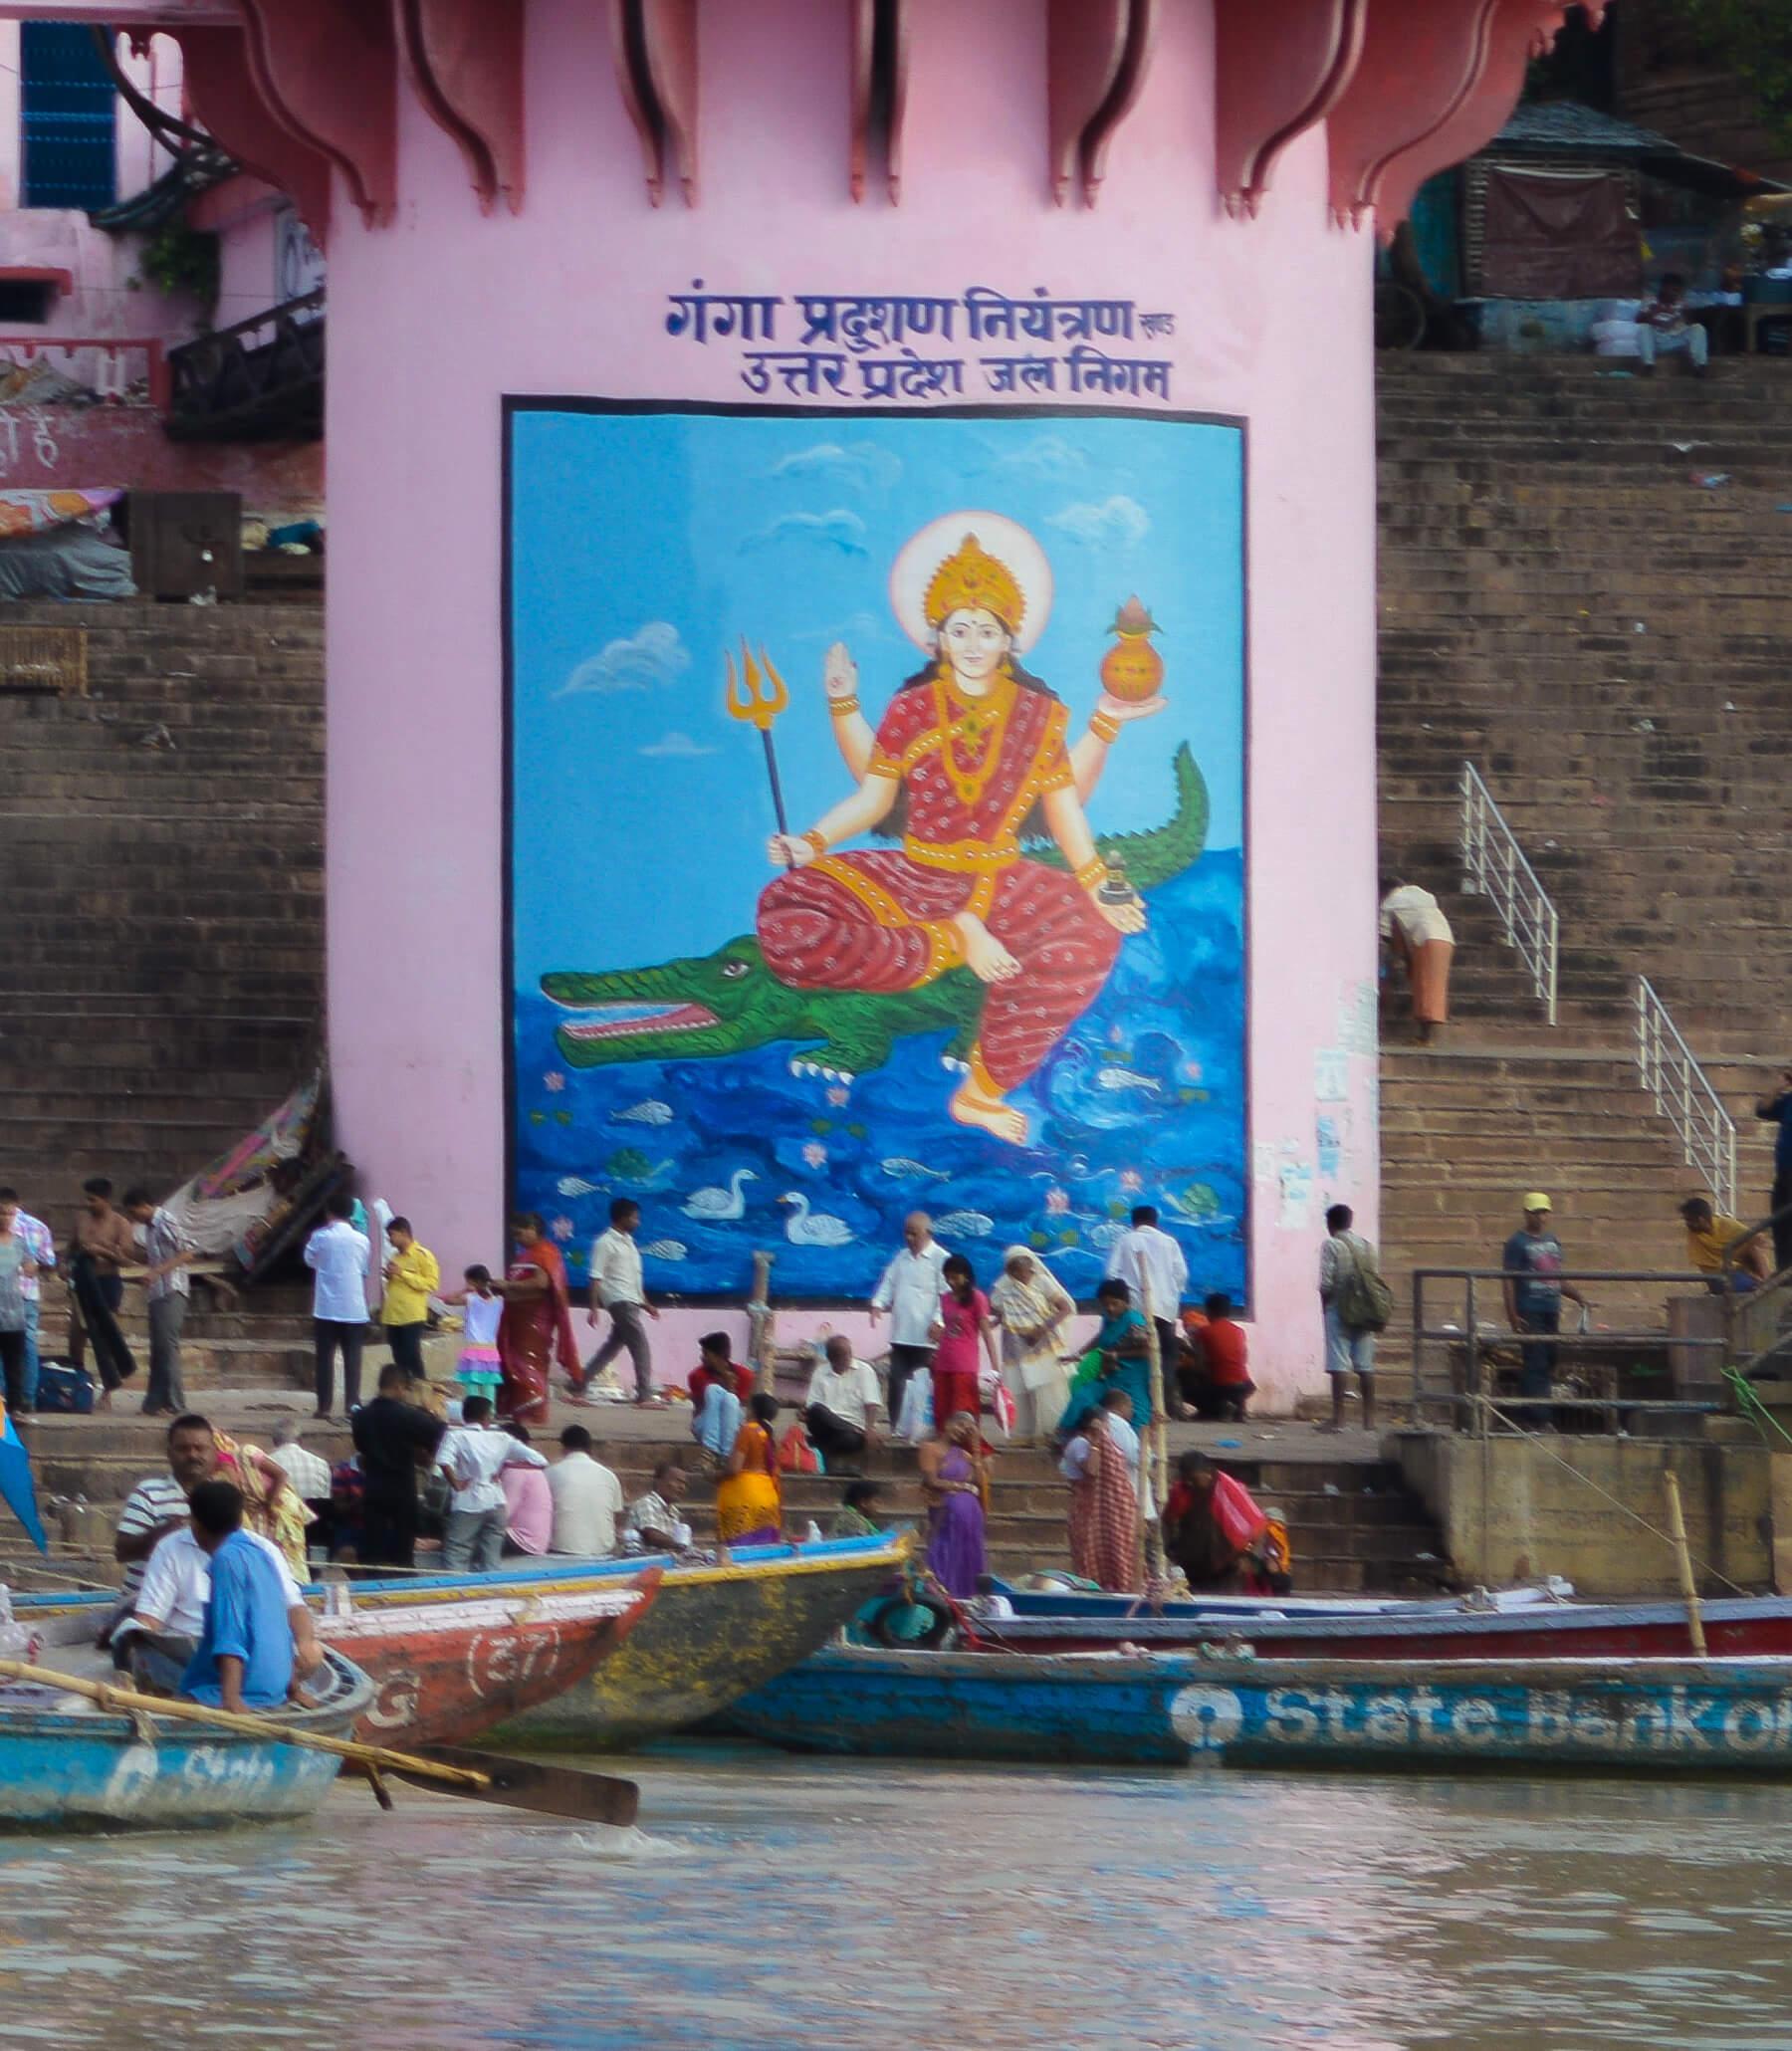 Painting printed on a water tower of Gangaji - Hindu goddess at River Ganges